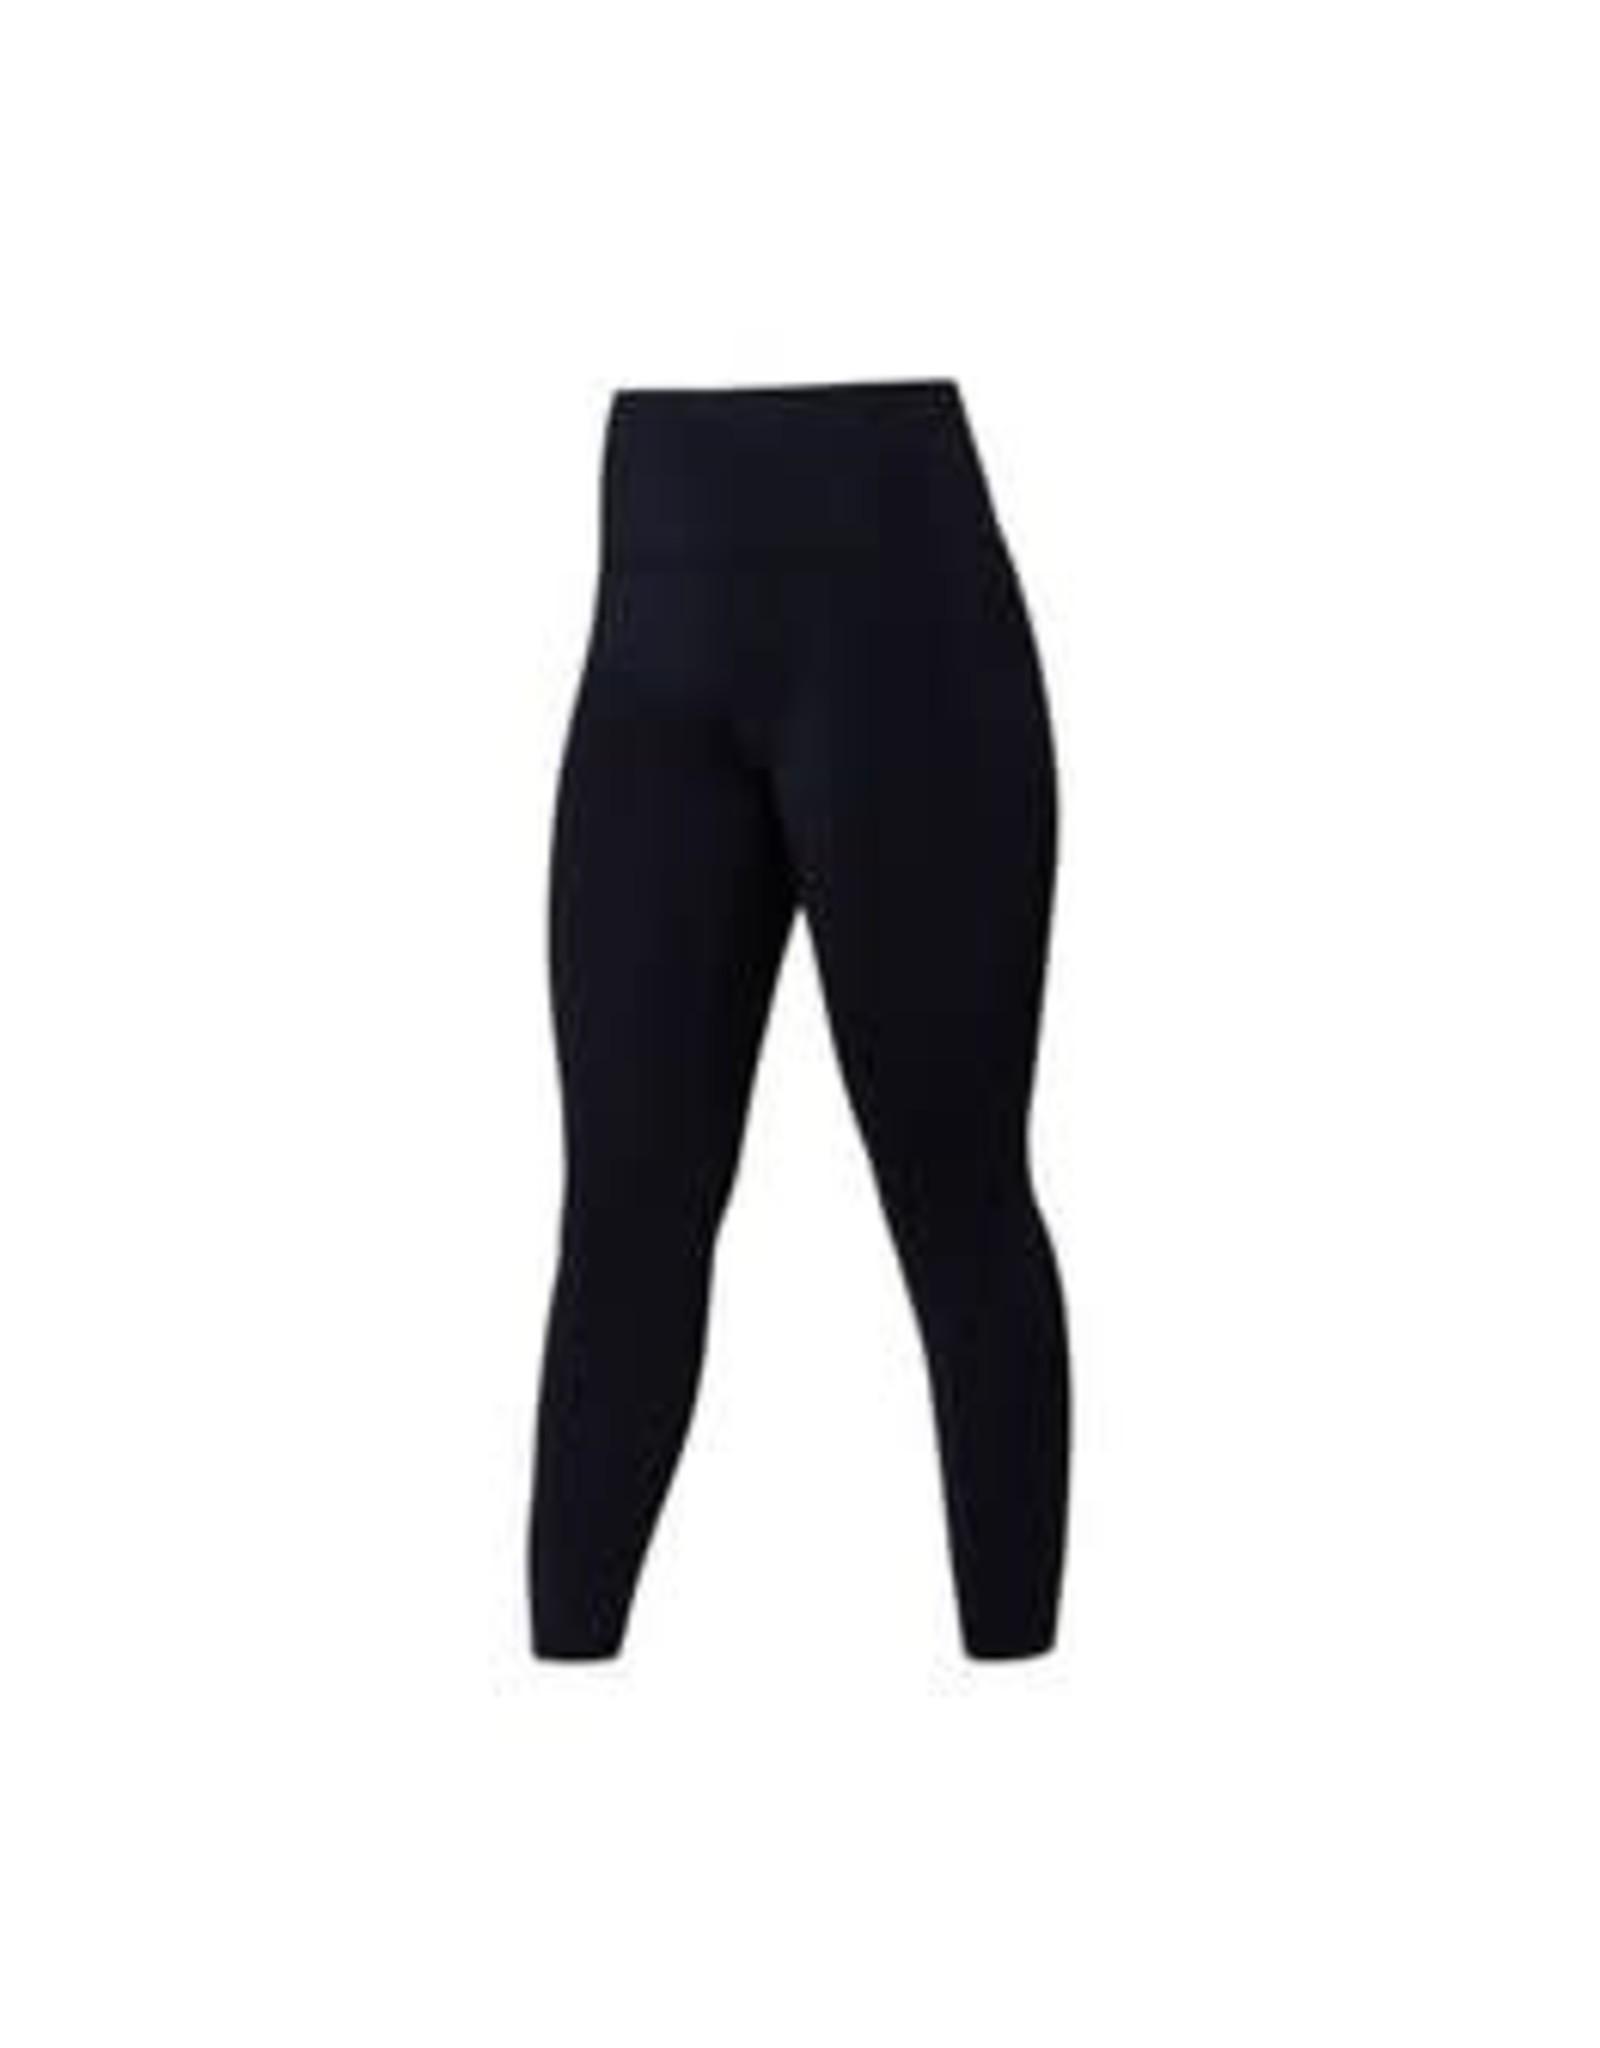 Energetiks Energetiks black clea leggings child